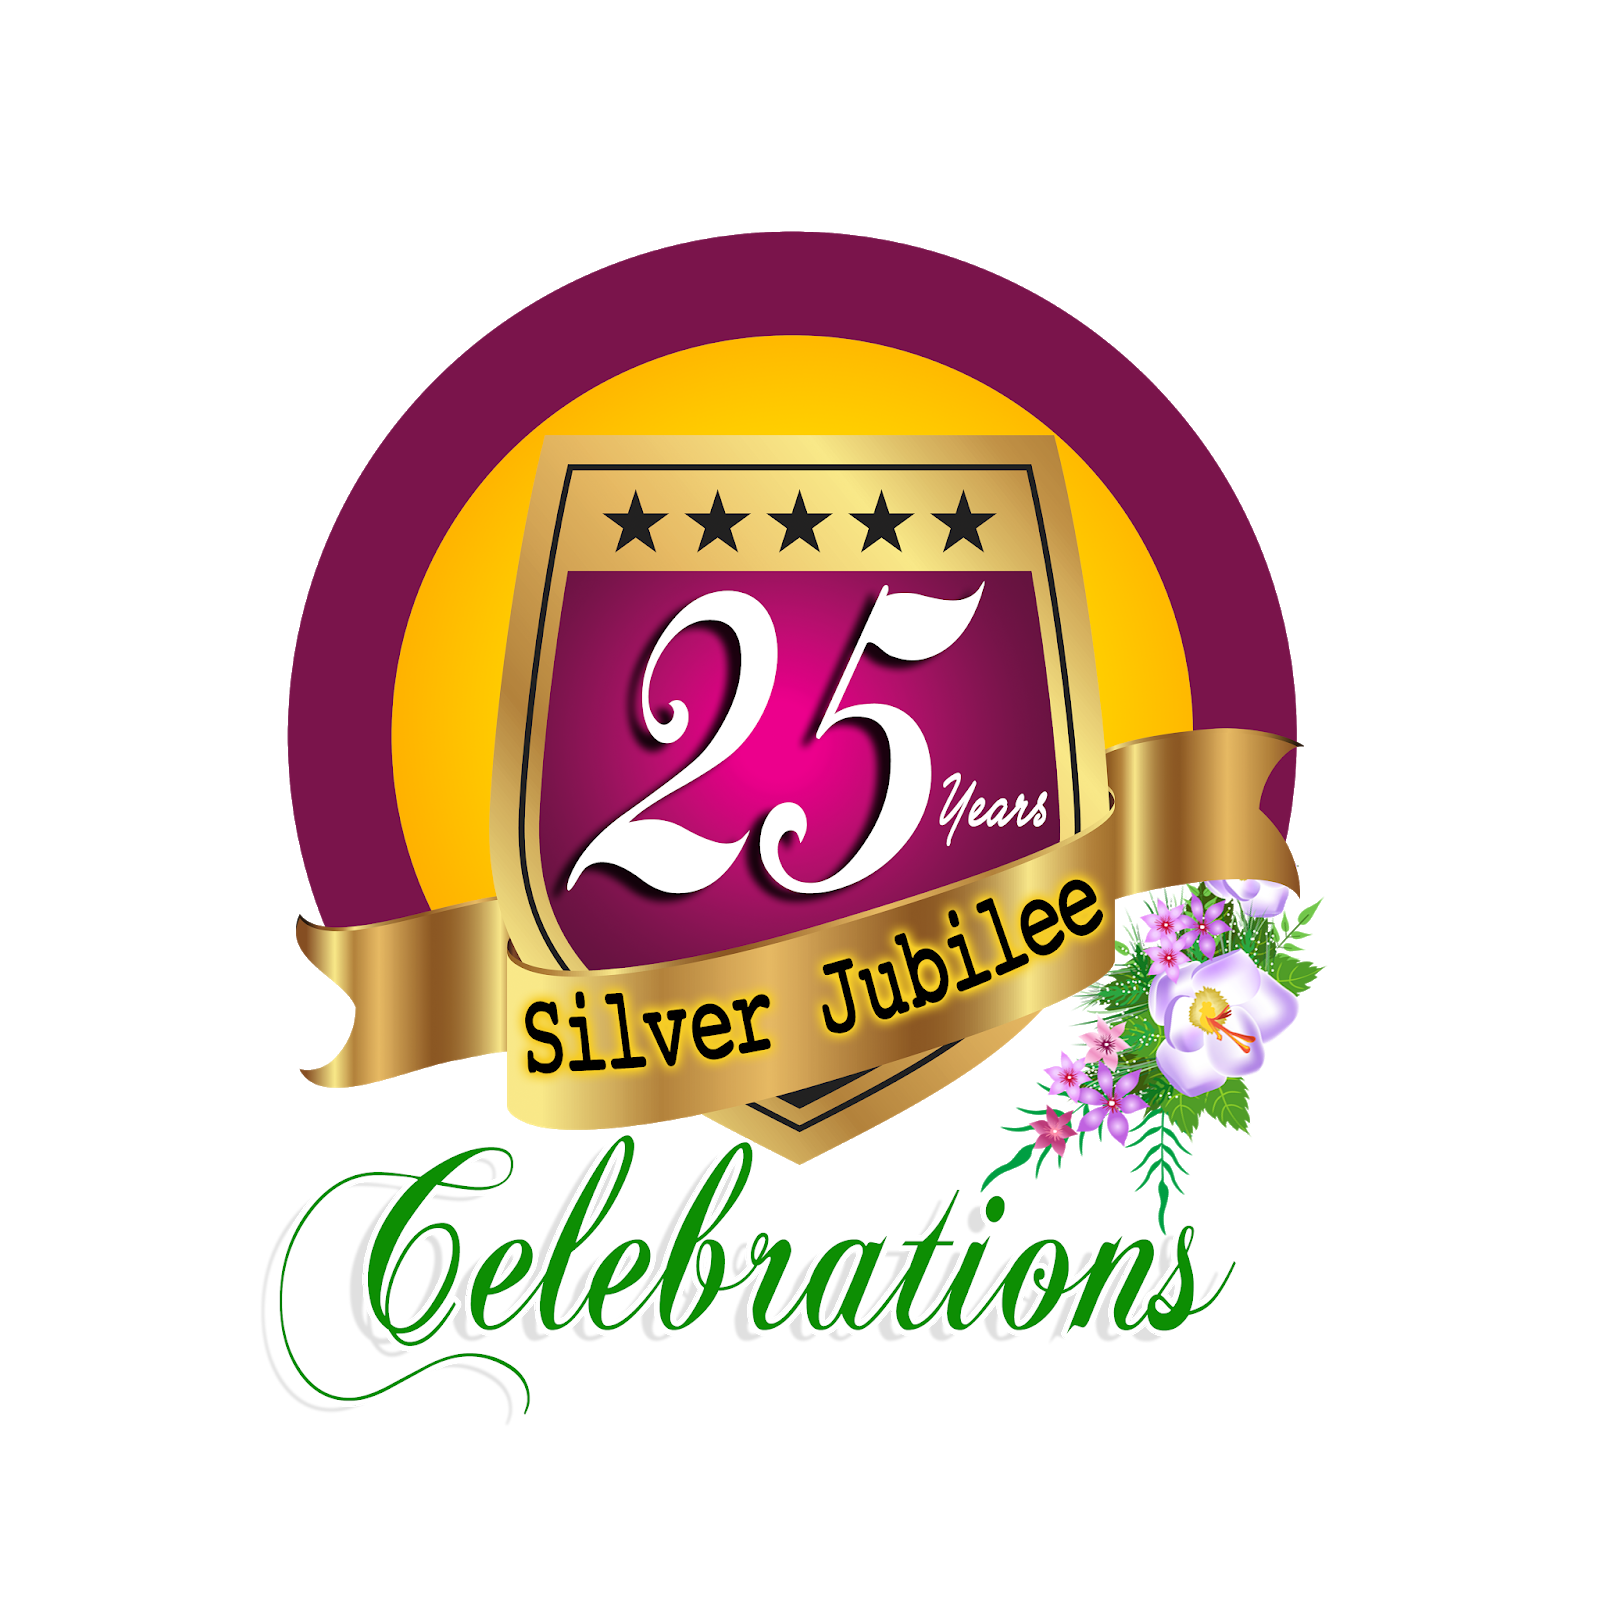 25 years silver jubilee celebrations hd png logo free downloads.